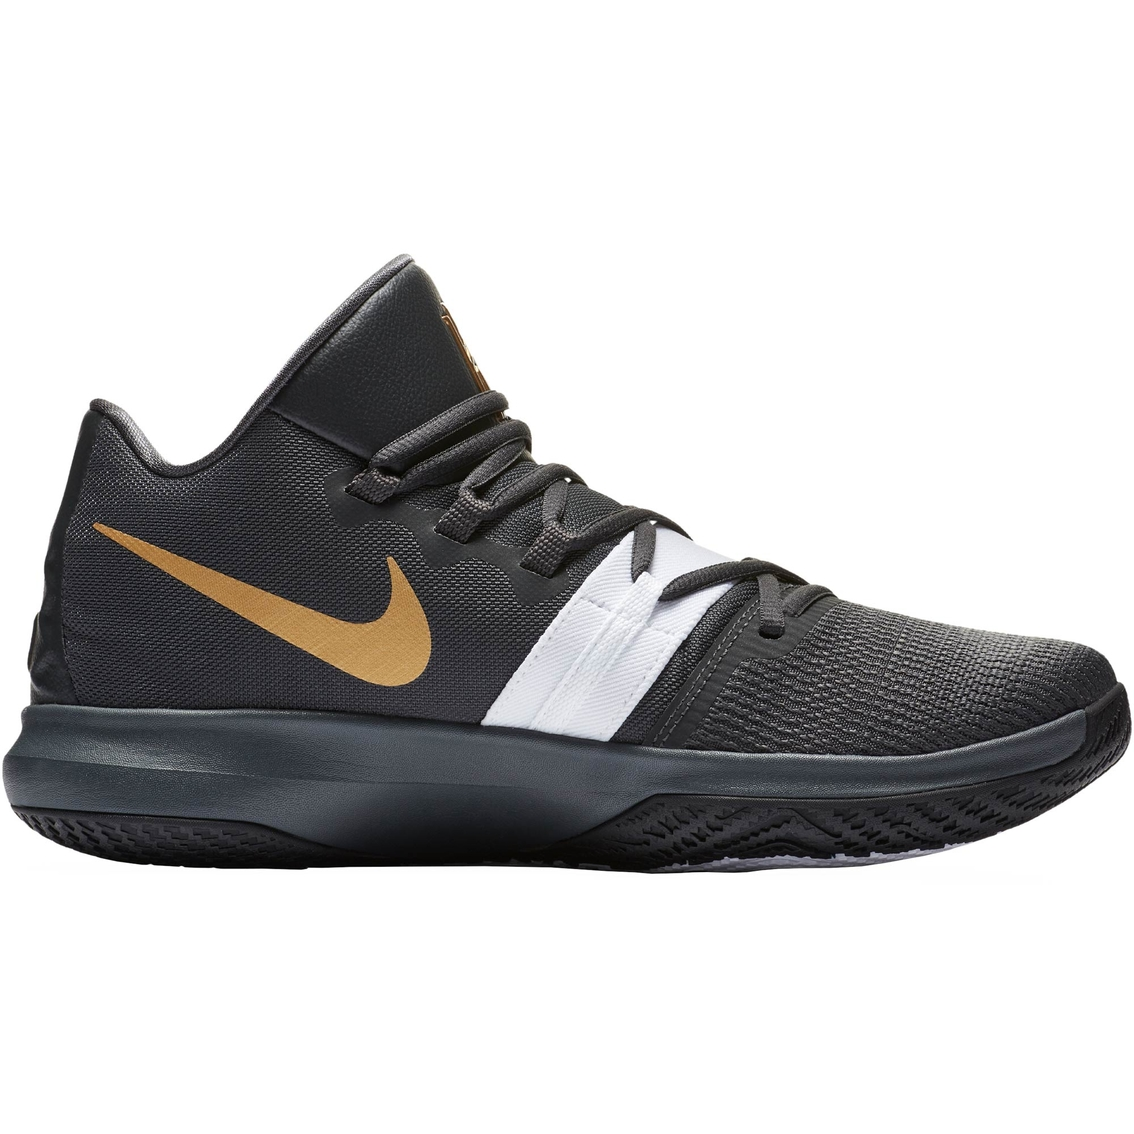 ba64135d863e Nike Men s Kyrie Flytrap Basketball Shoes